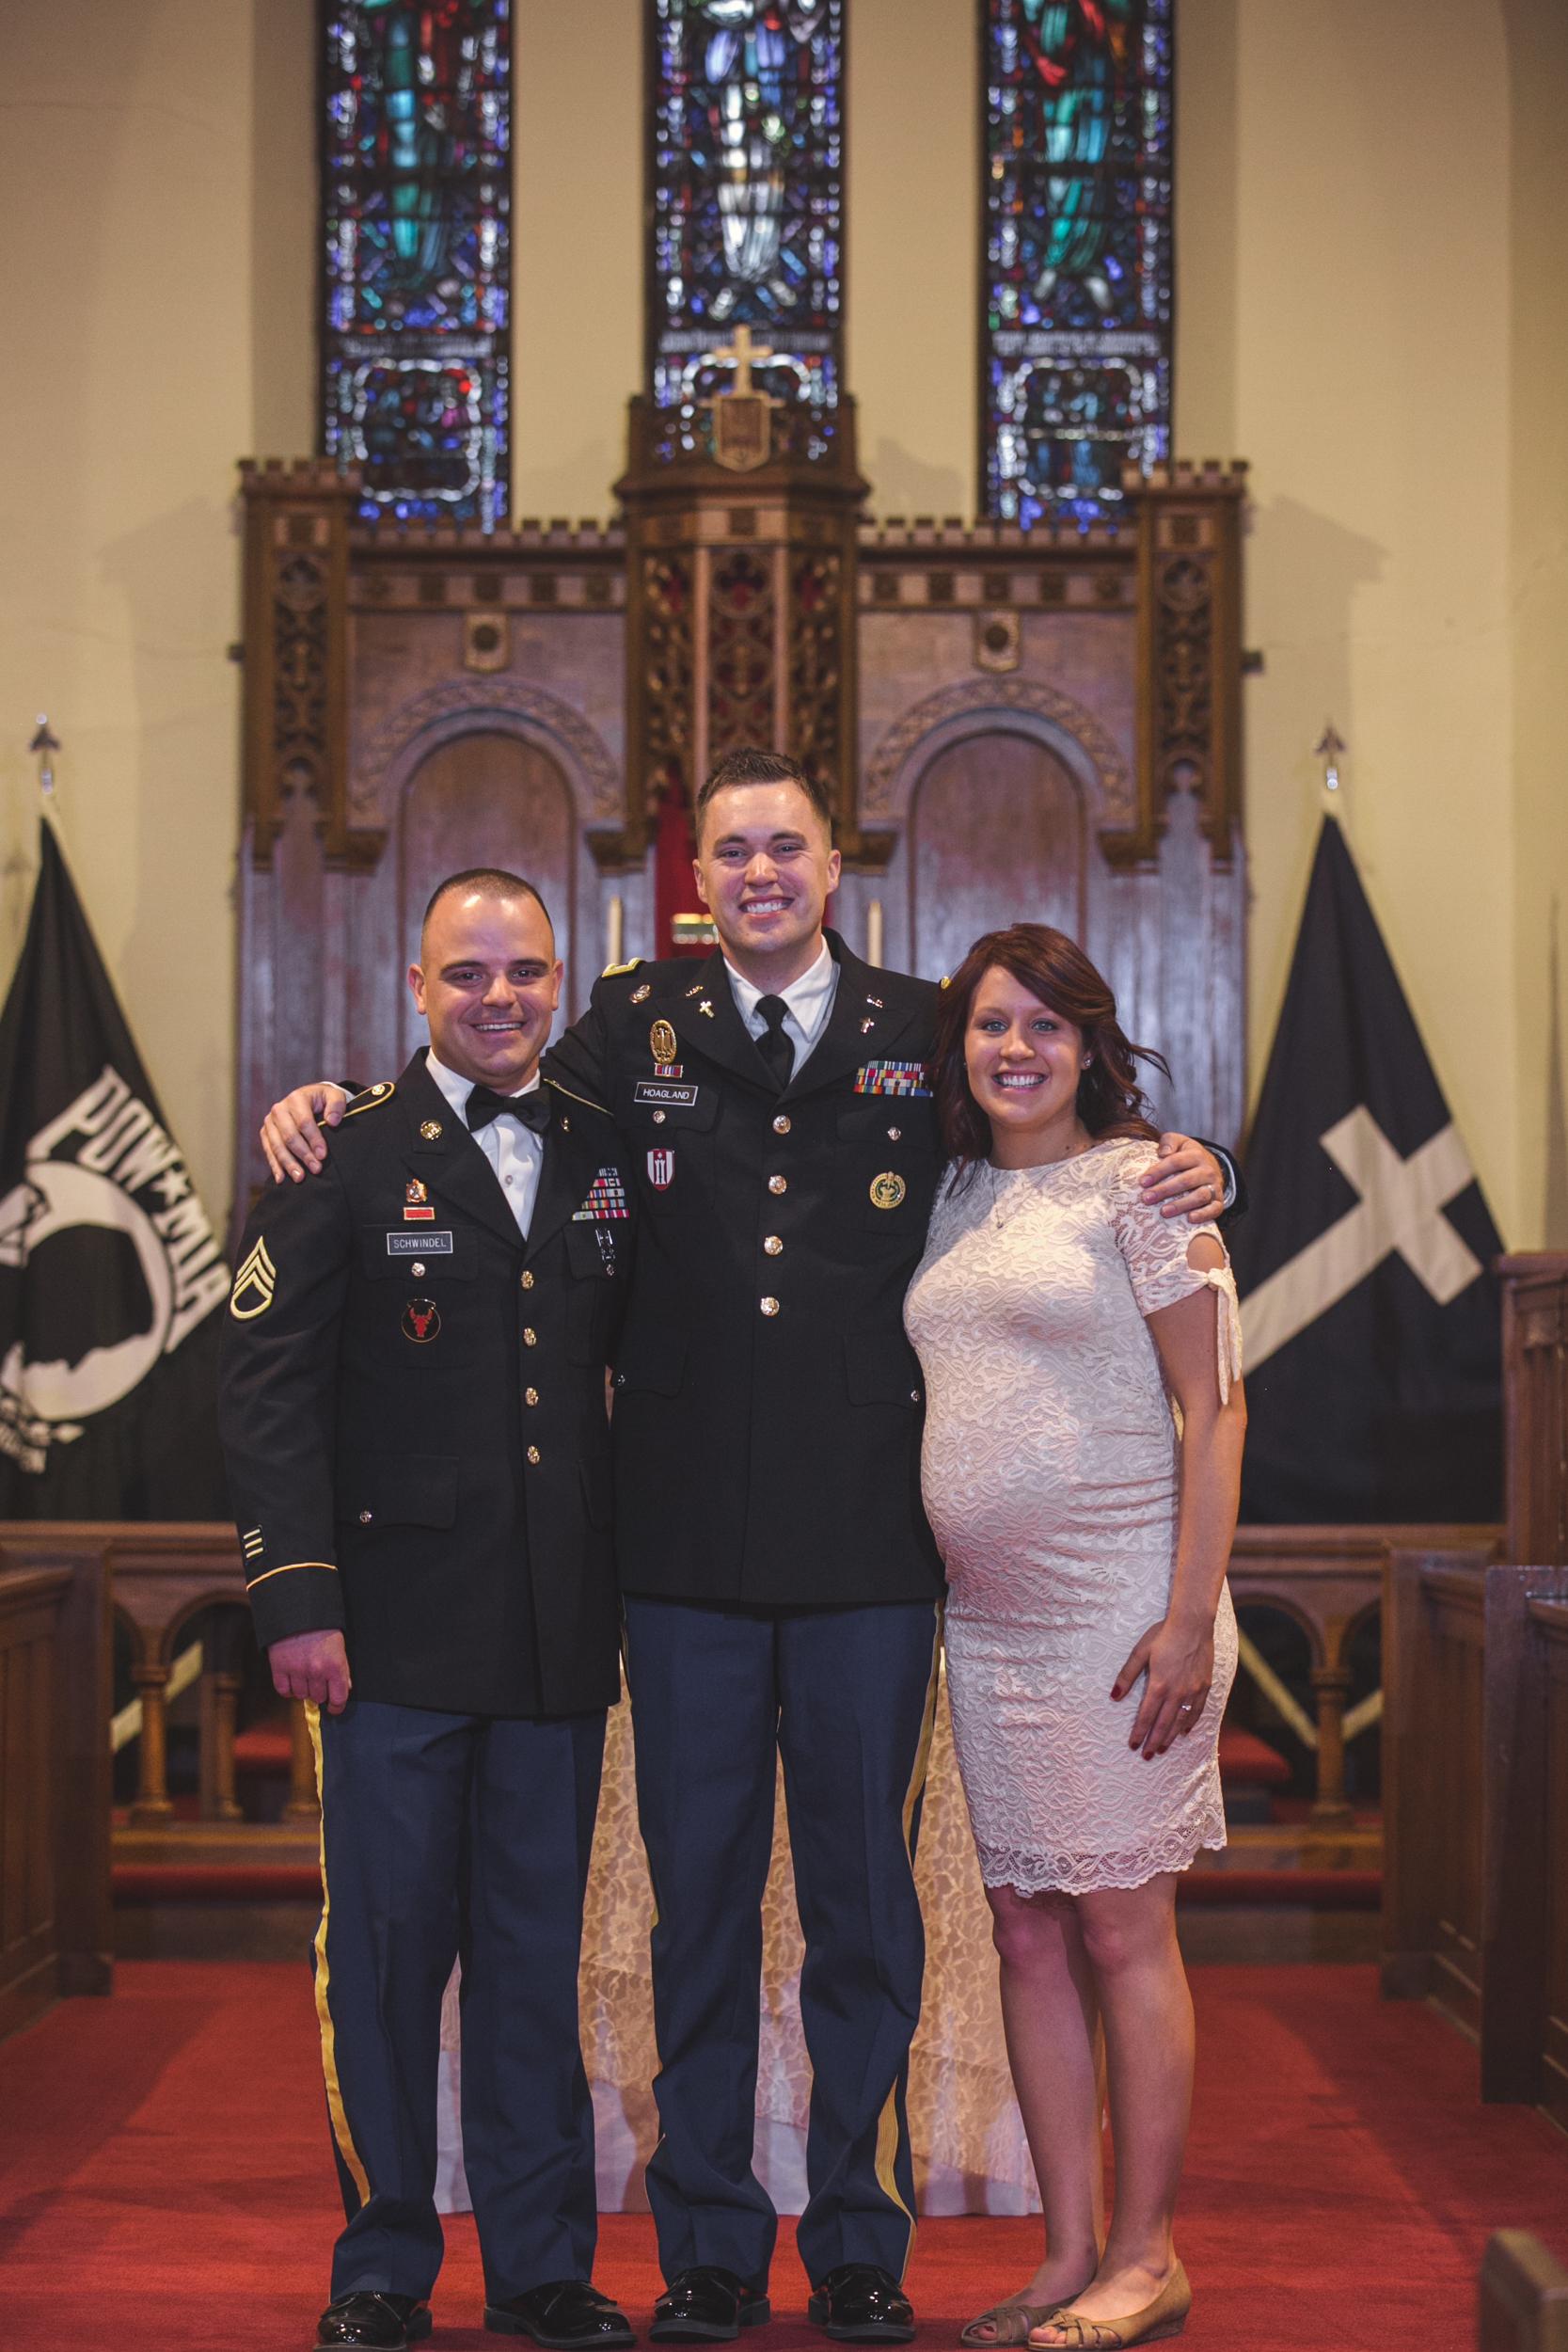 Fort Snelling Elopement St. Paul, MN, Fort Snelling Elopement, Military Elopement, Intimate Military Wedding, intimate elopement wedding-www.rachelsmak.com36.jpg